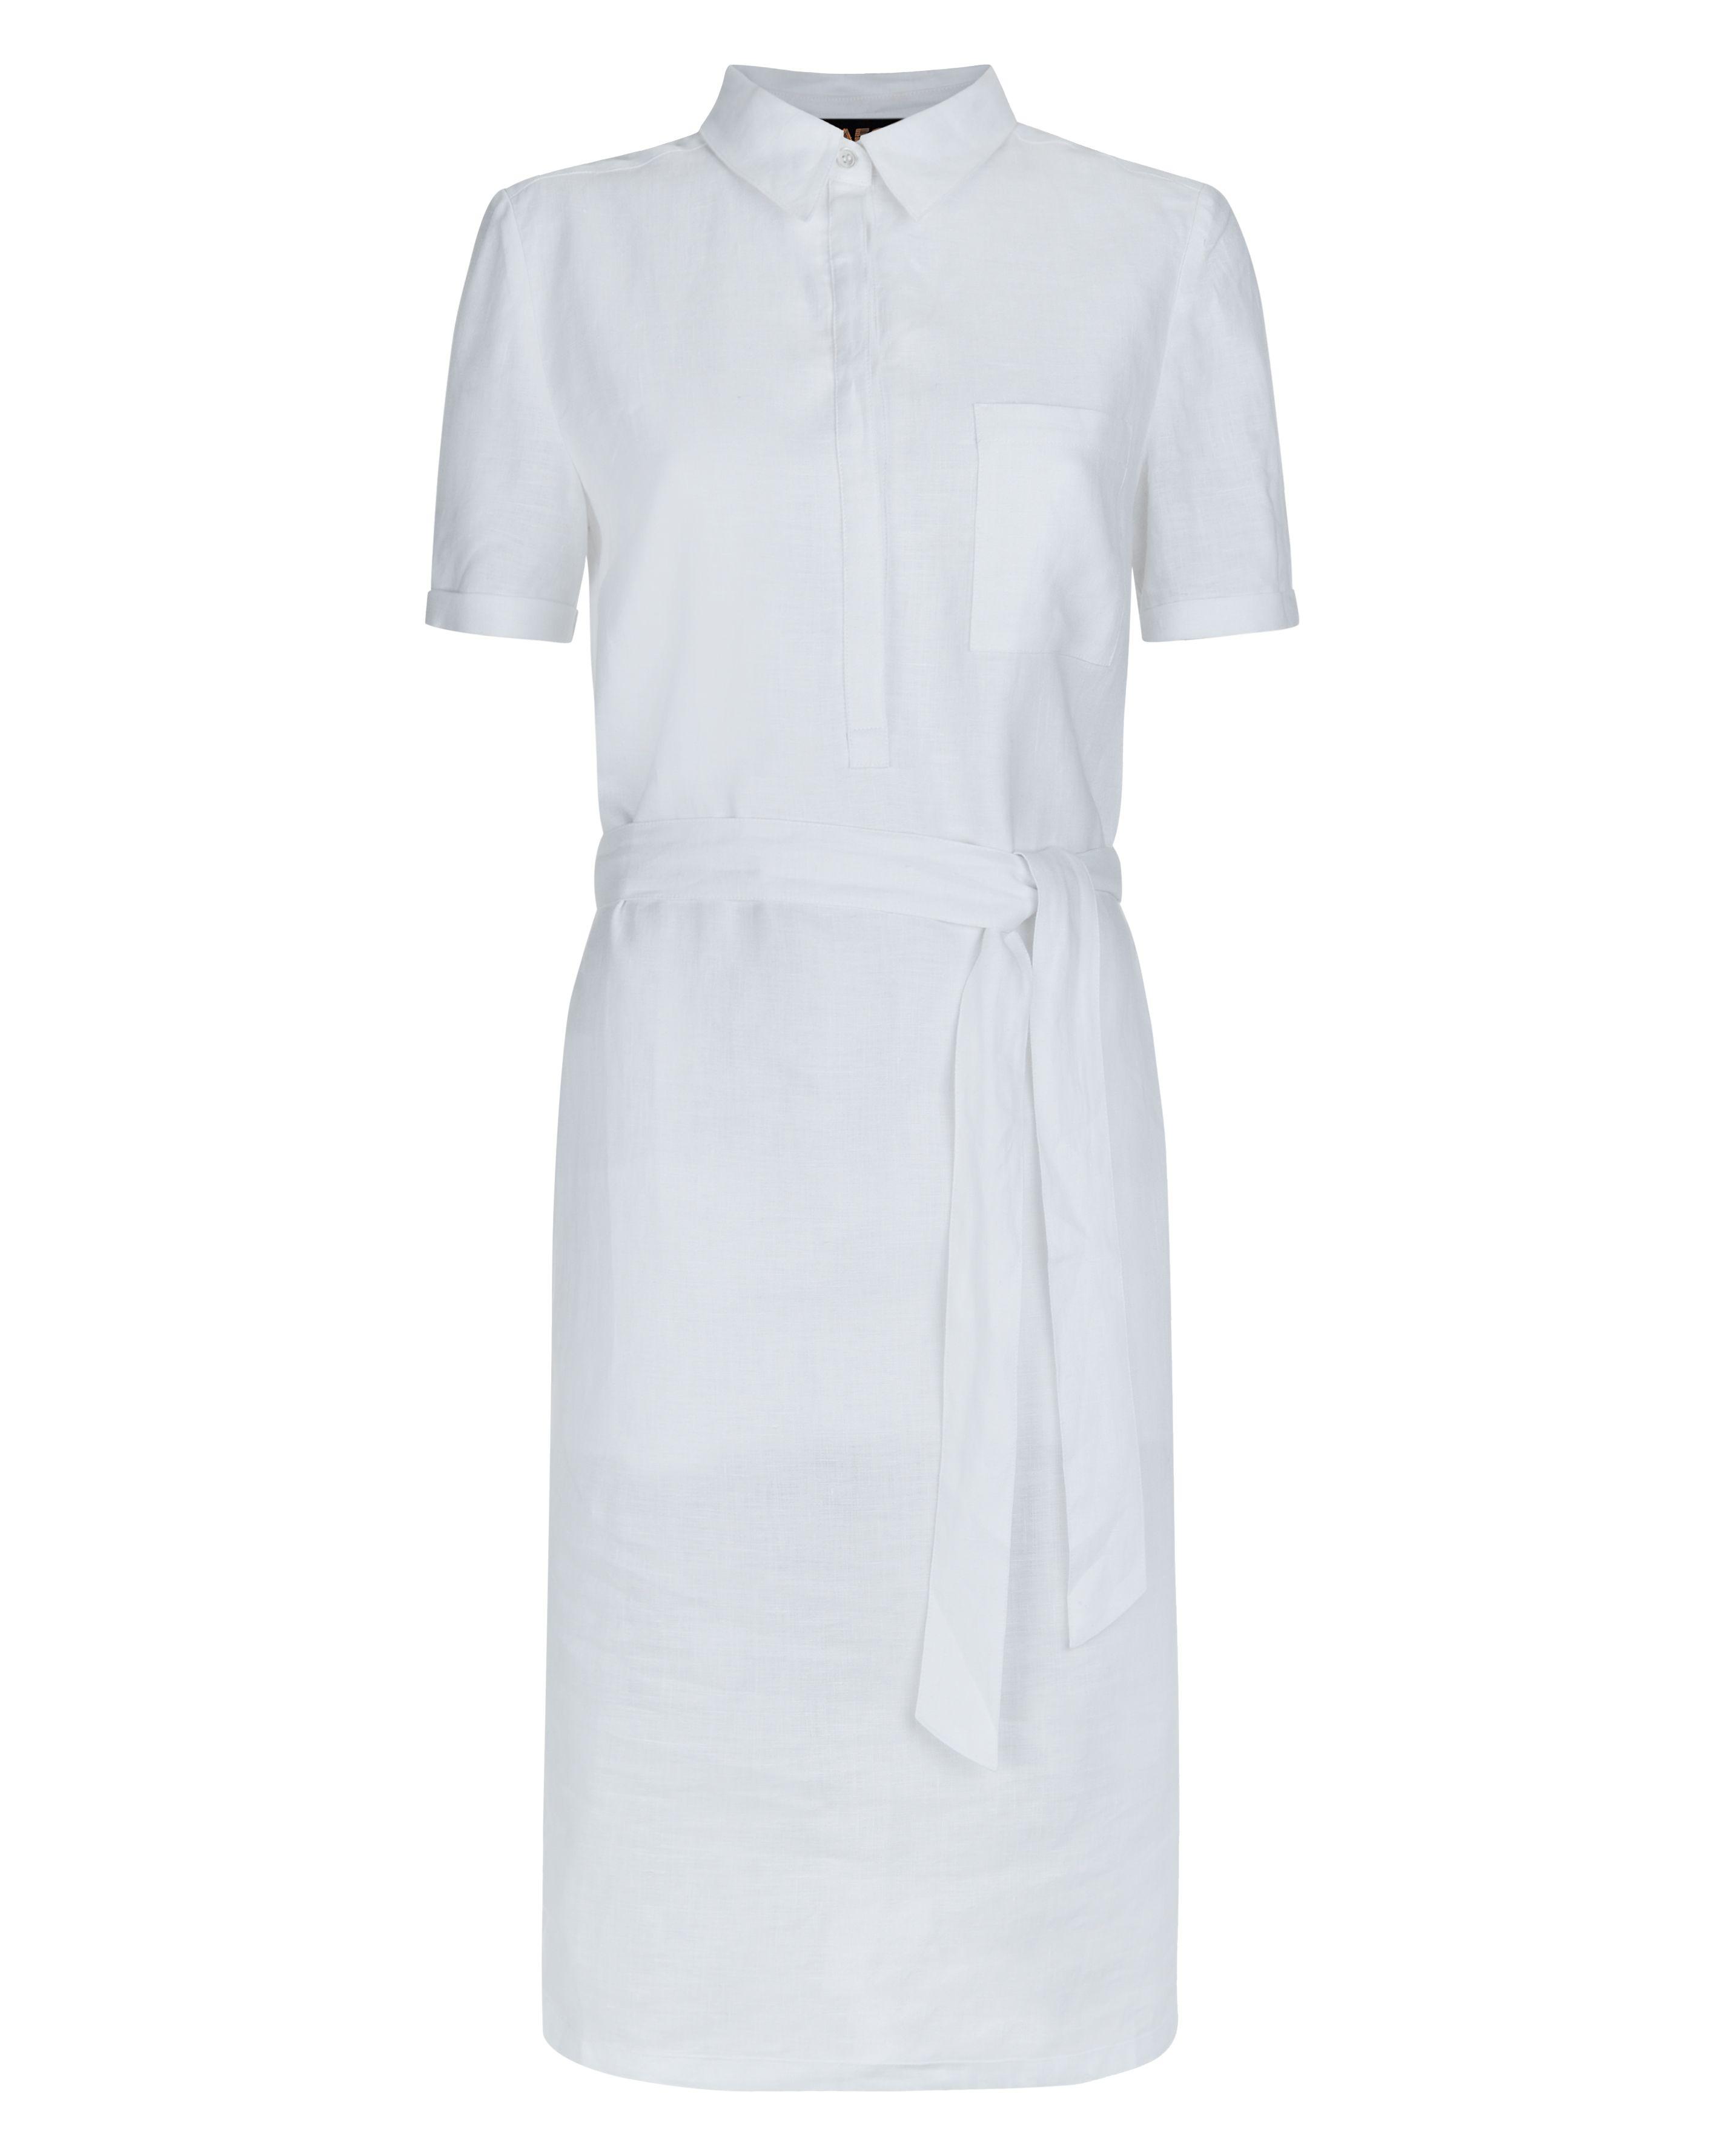 Lyst jaeger linen casual shirt dress in white for White linen dress shirt